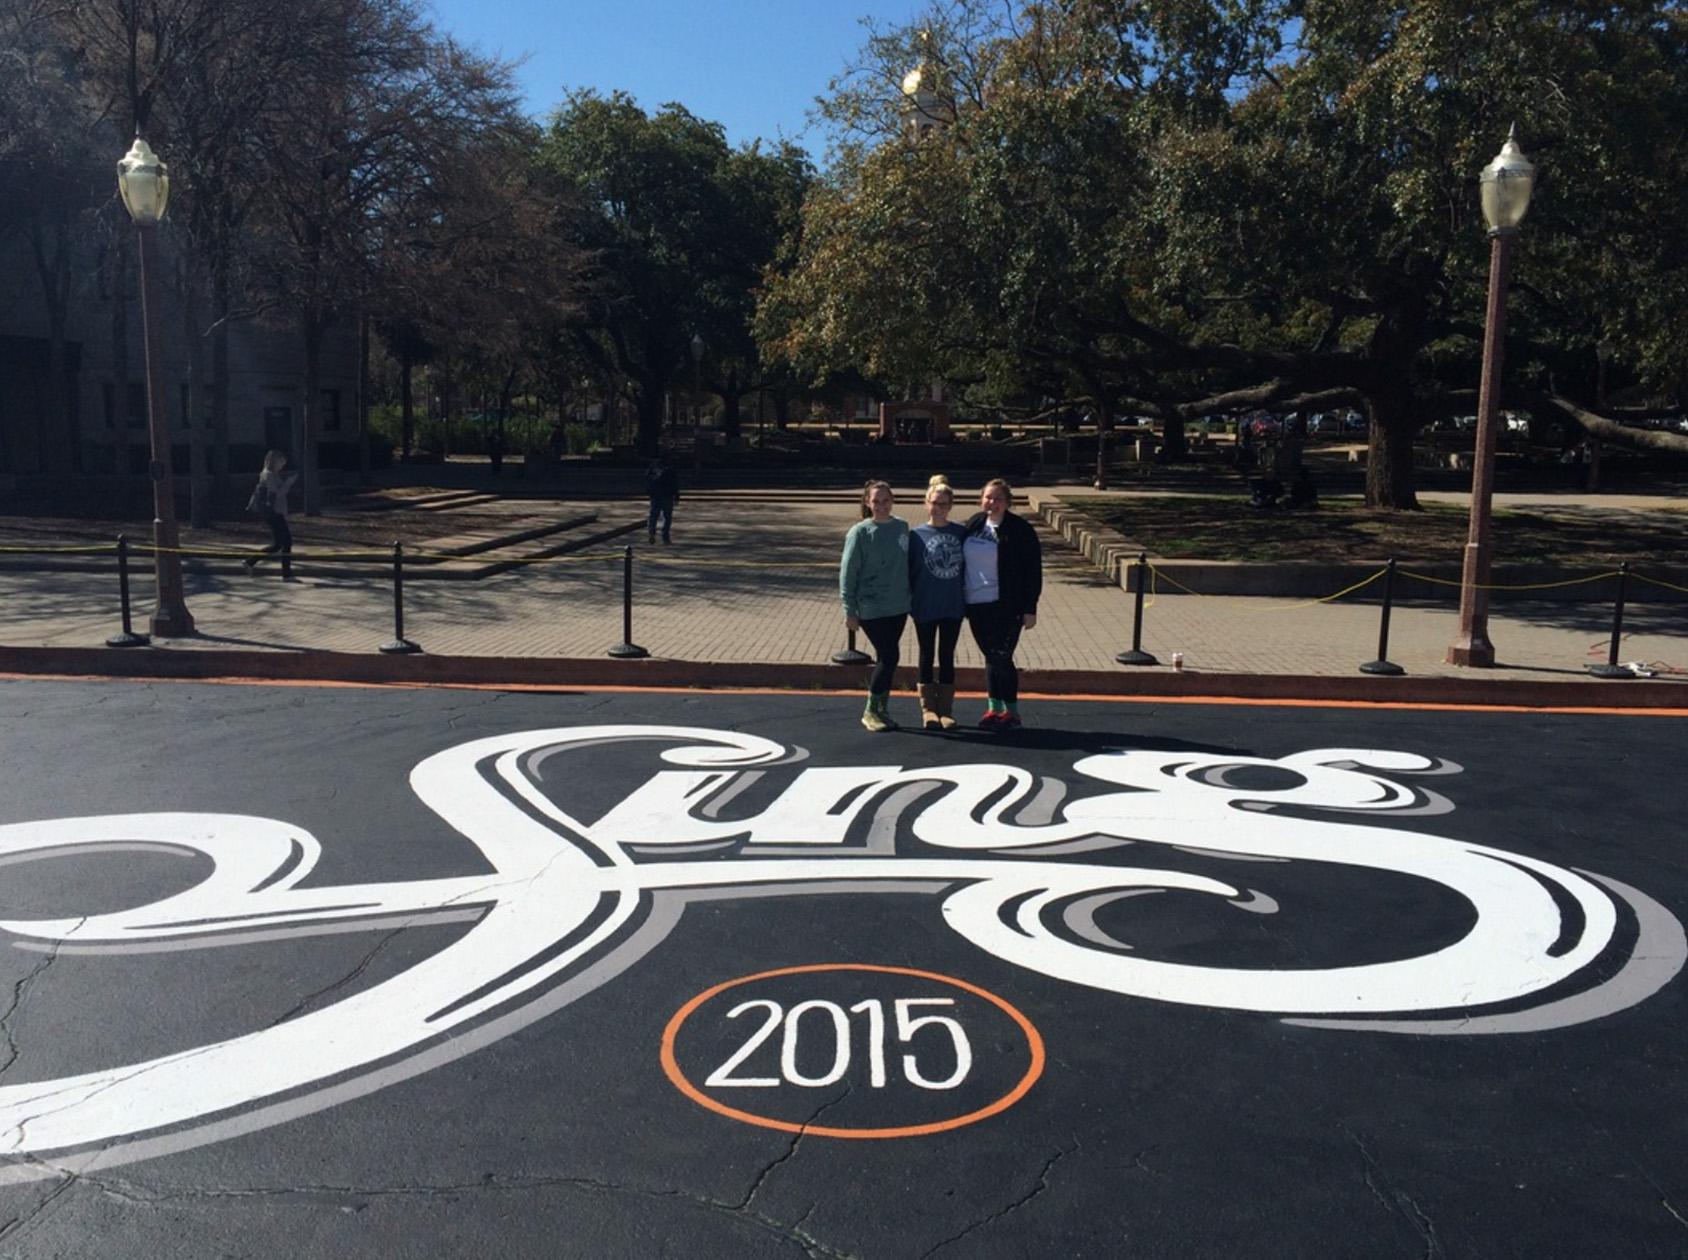 Baylor University - S 5th St, Waco, Texas (no longer present)